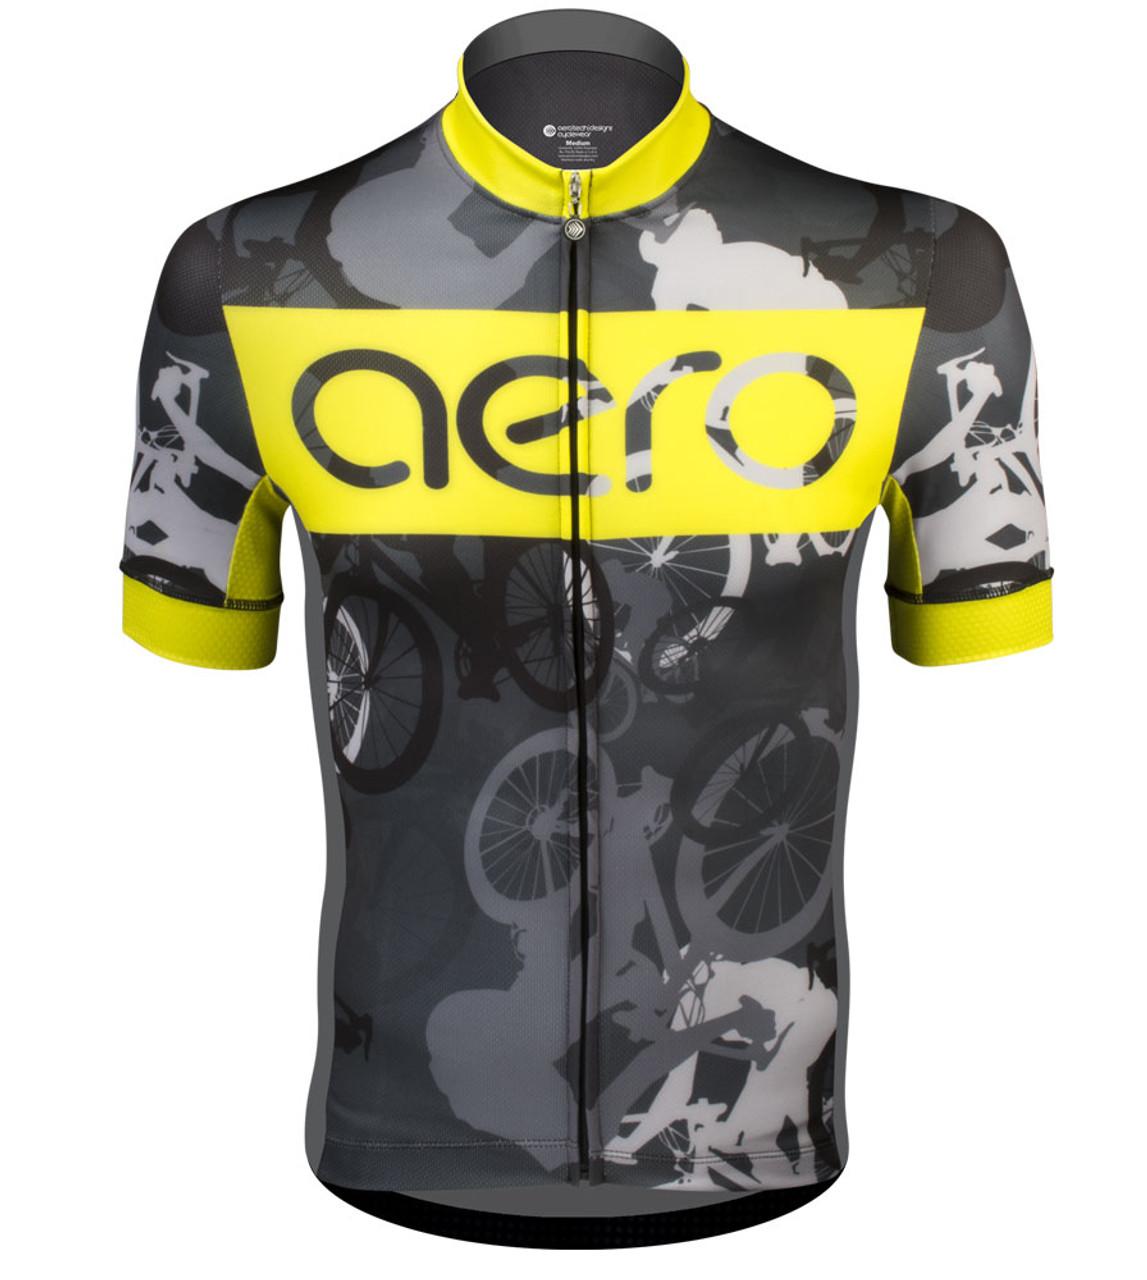 Aero Tech Men's Premiere Jersey - Urban Camouflage - Bike Racing Jersey